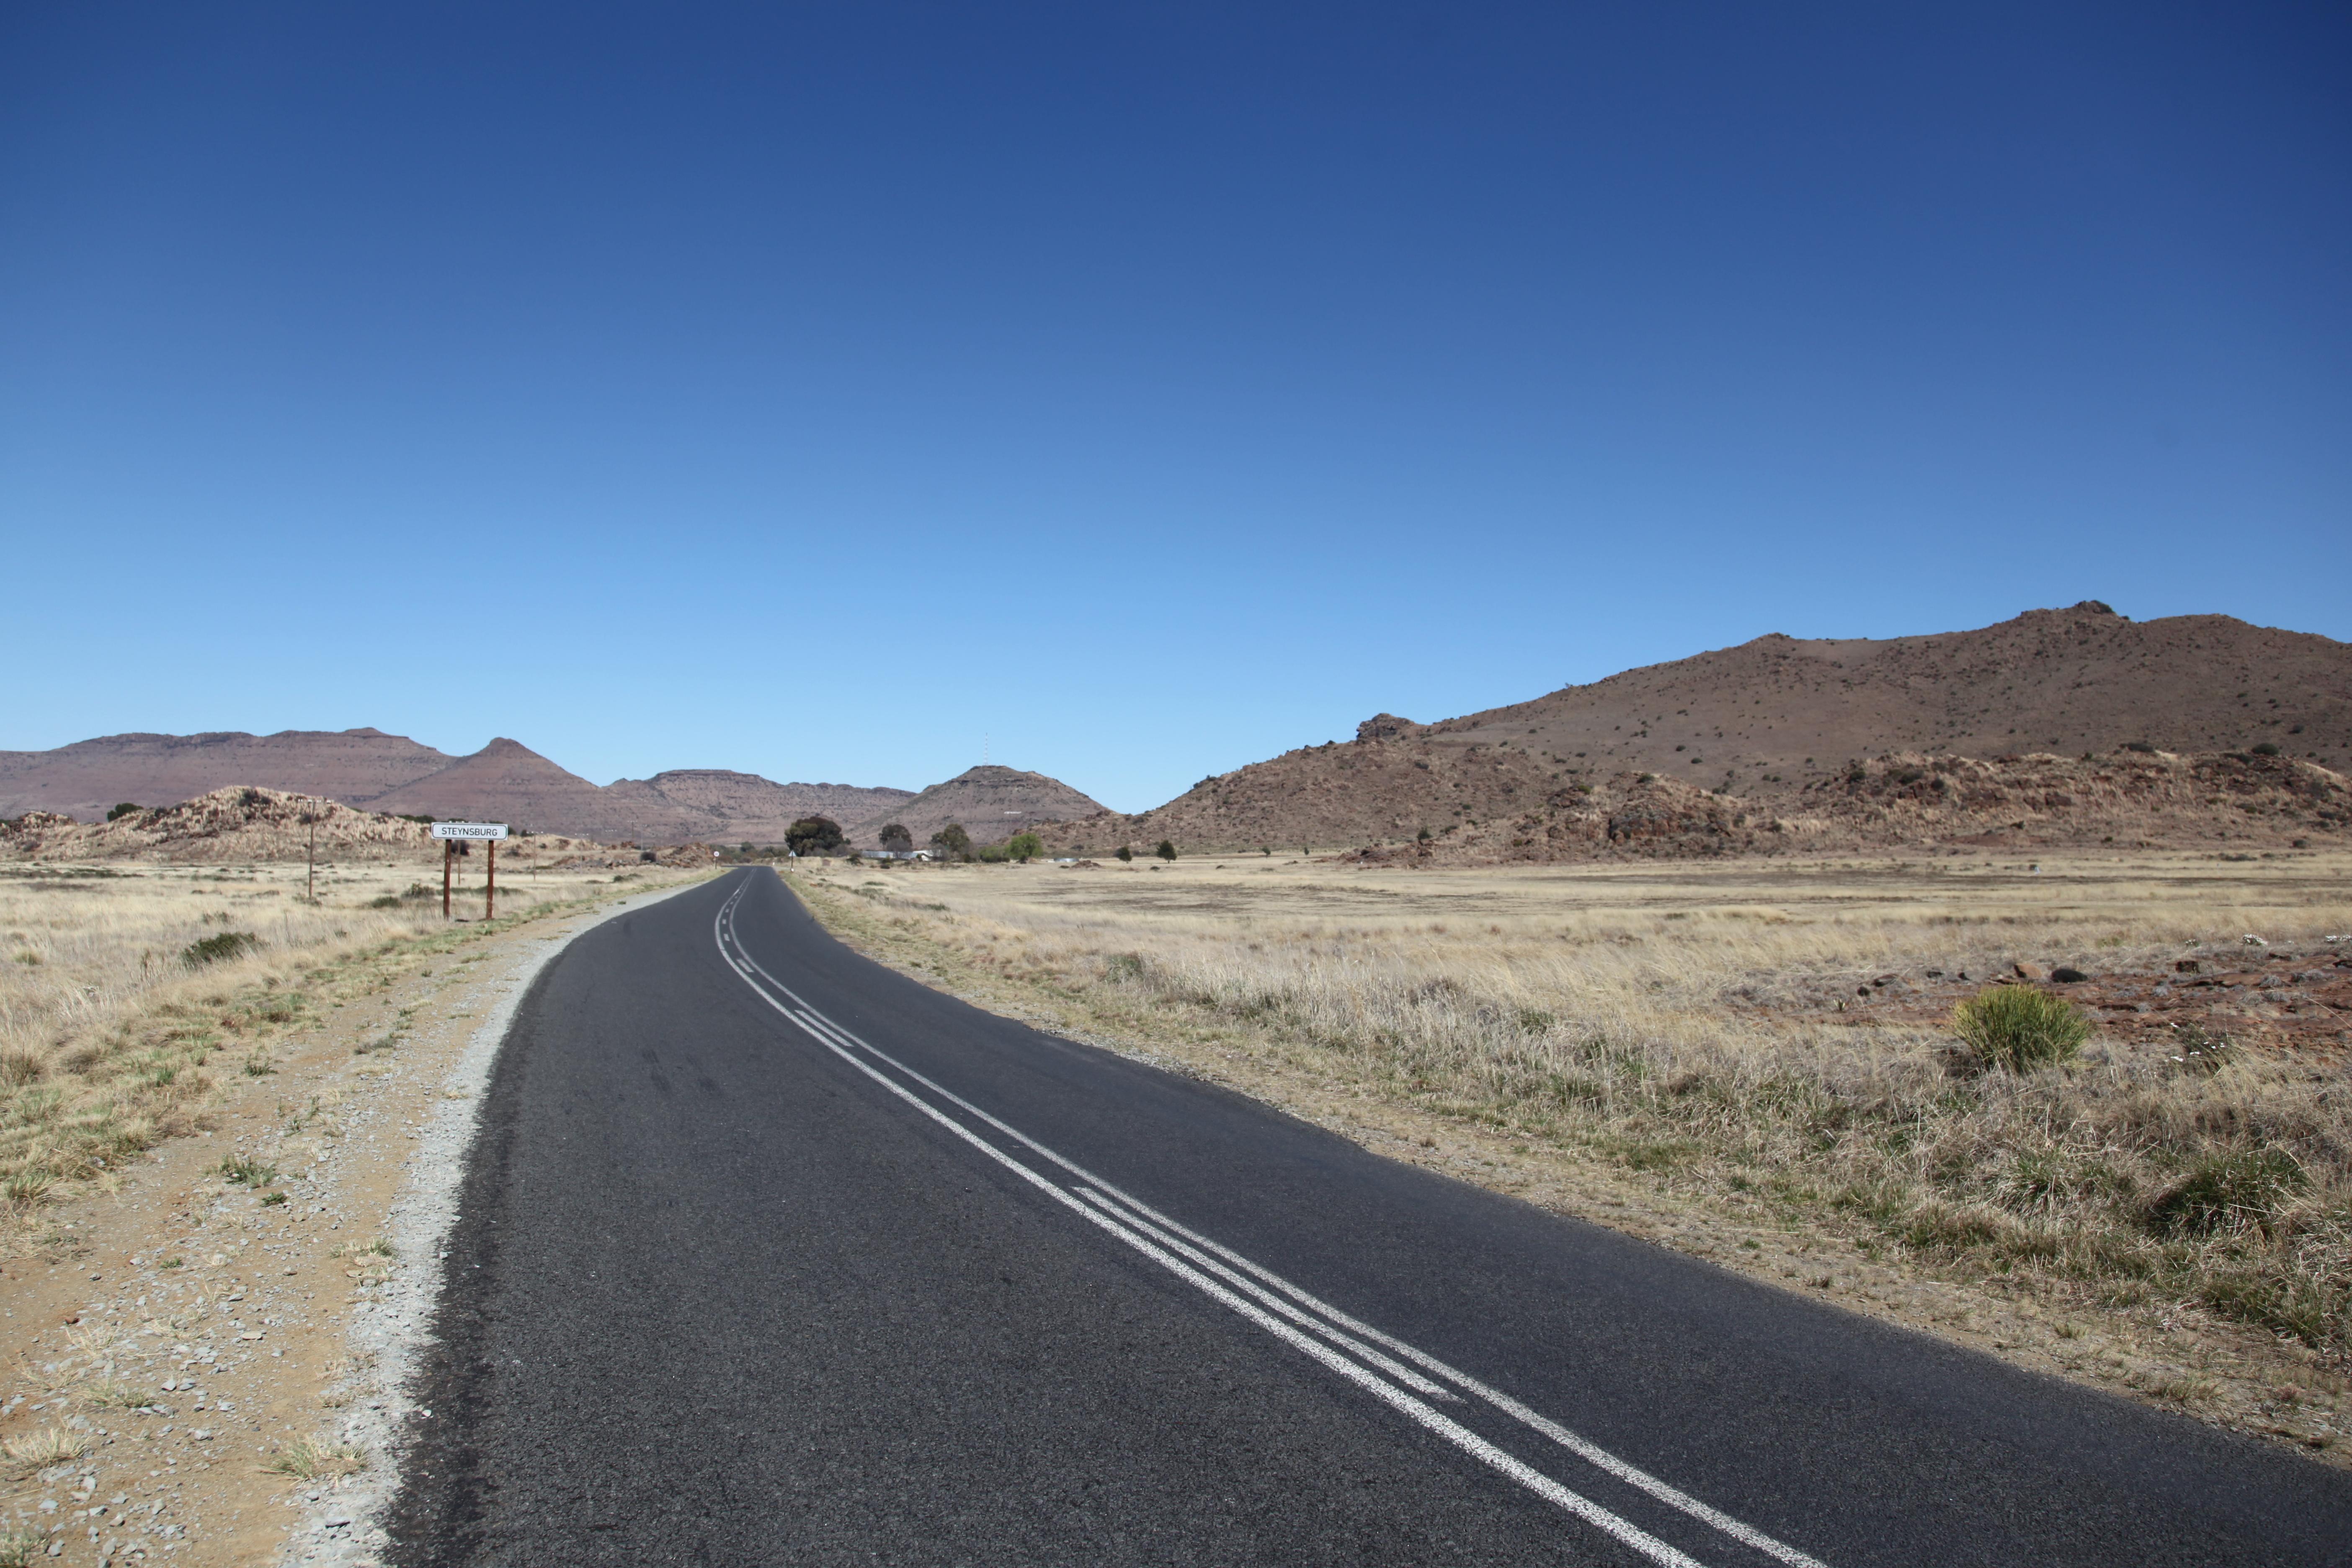 File:R390 road-001.JPG - Wikimedia Commons Road